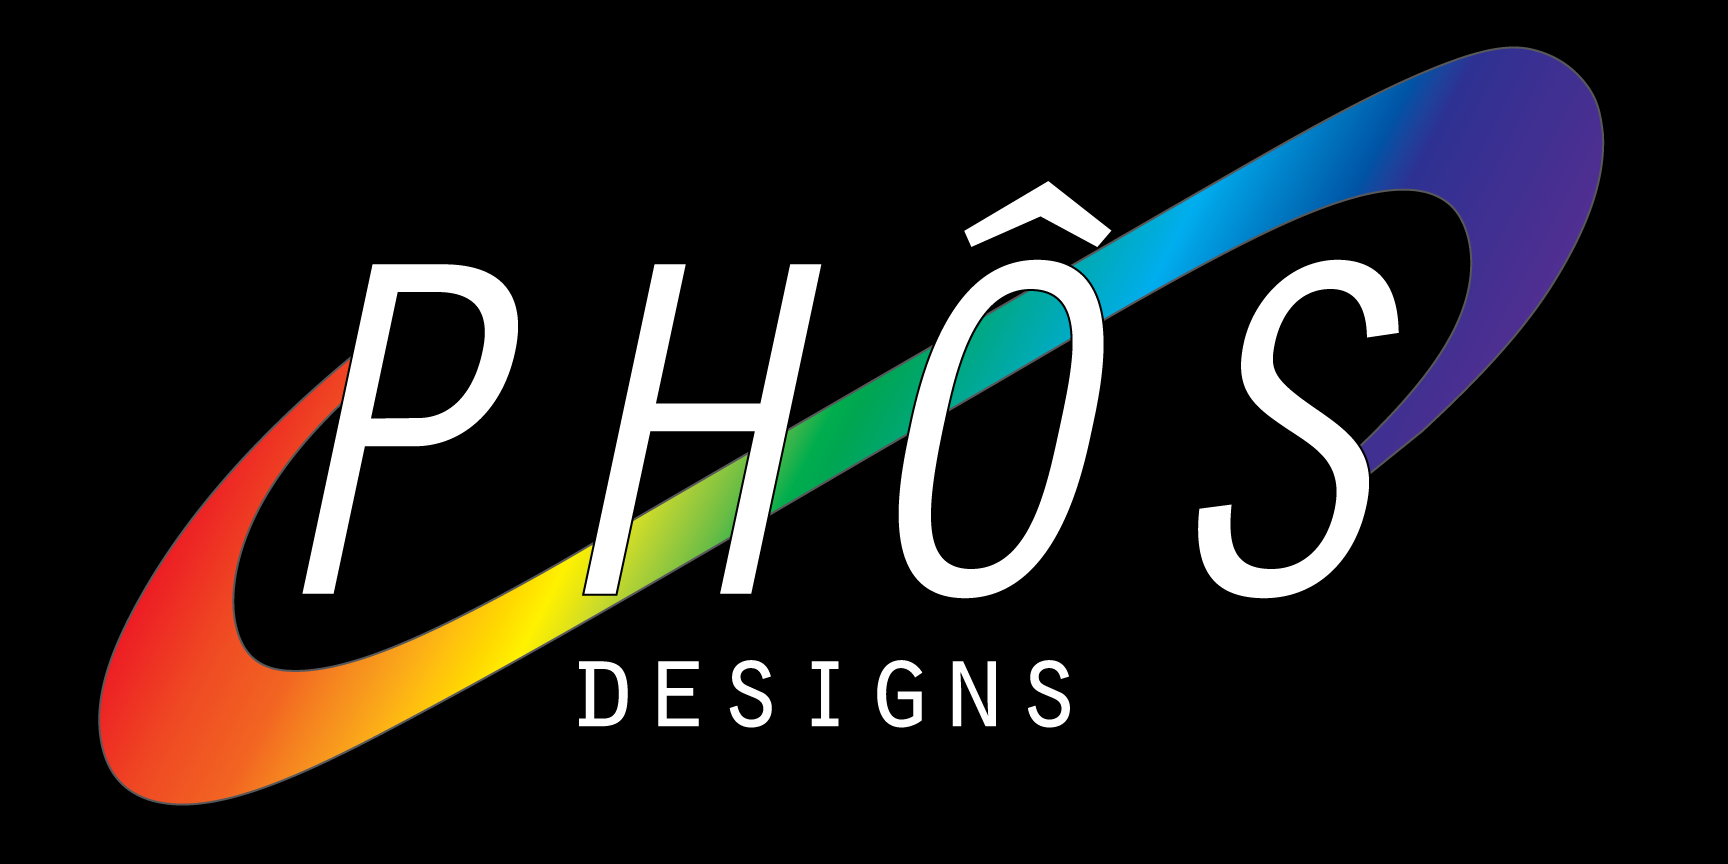 Phos Design welcome to phos designs!